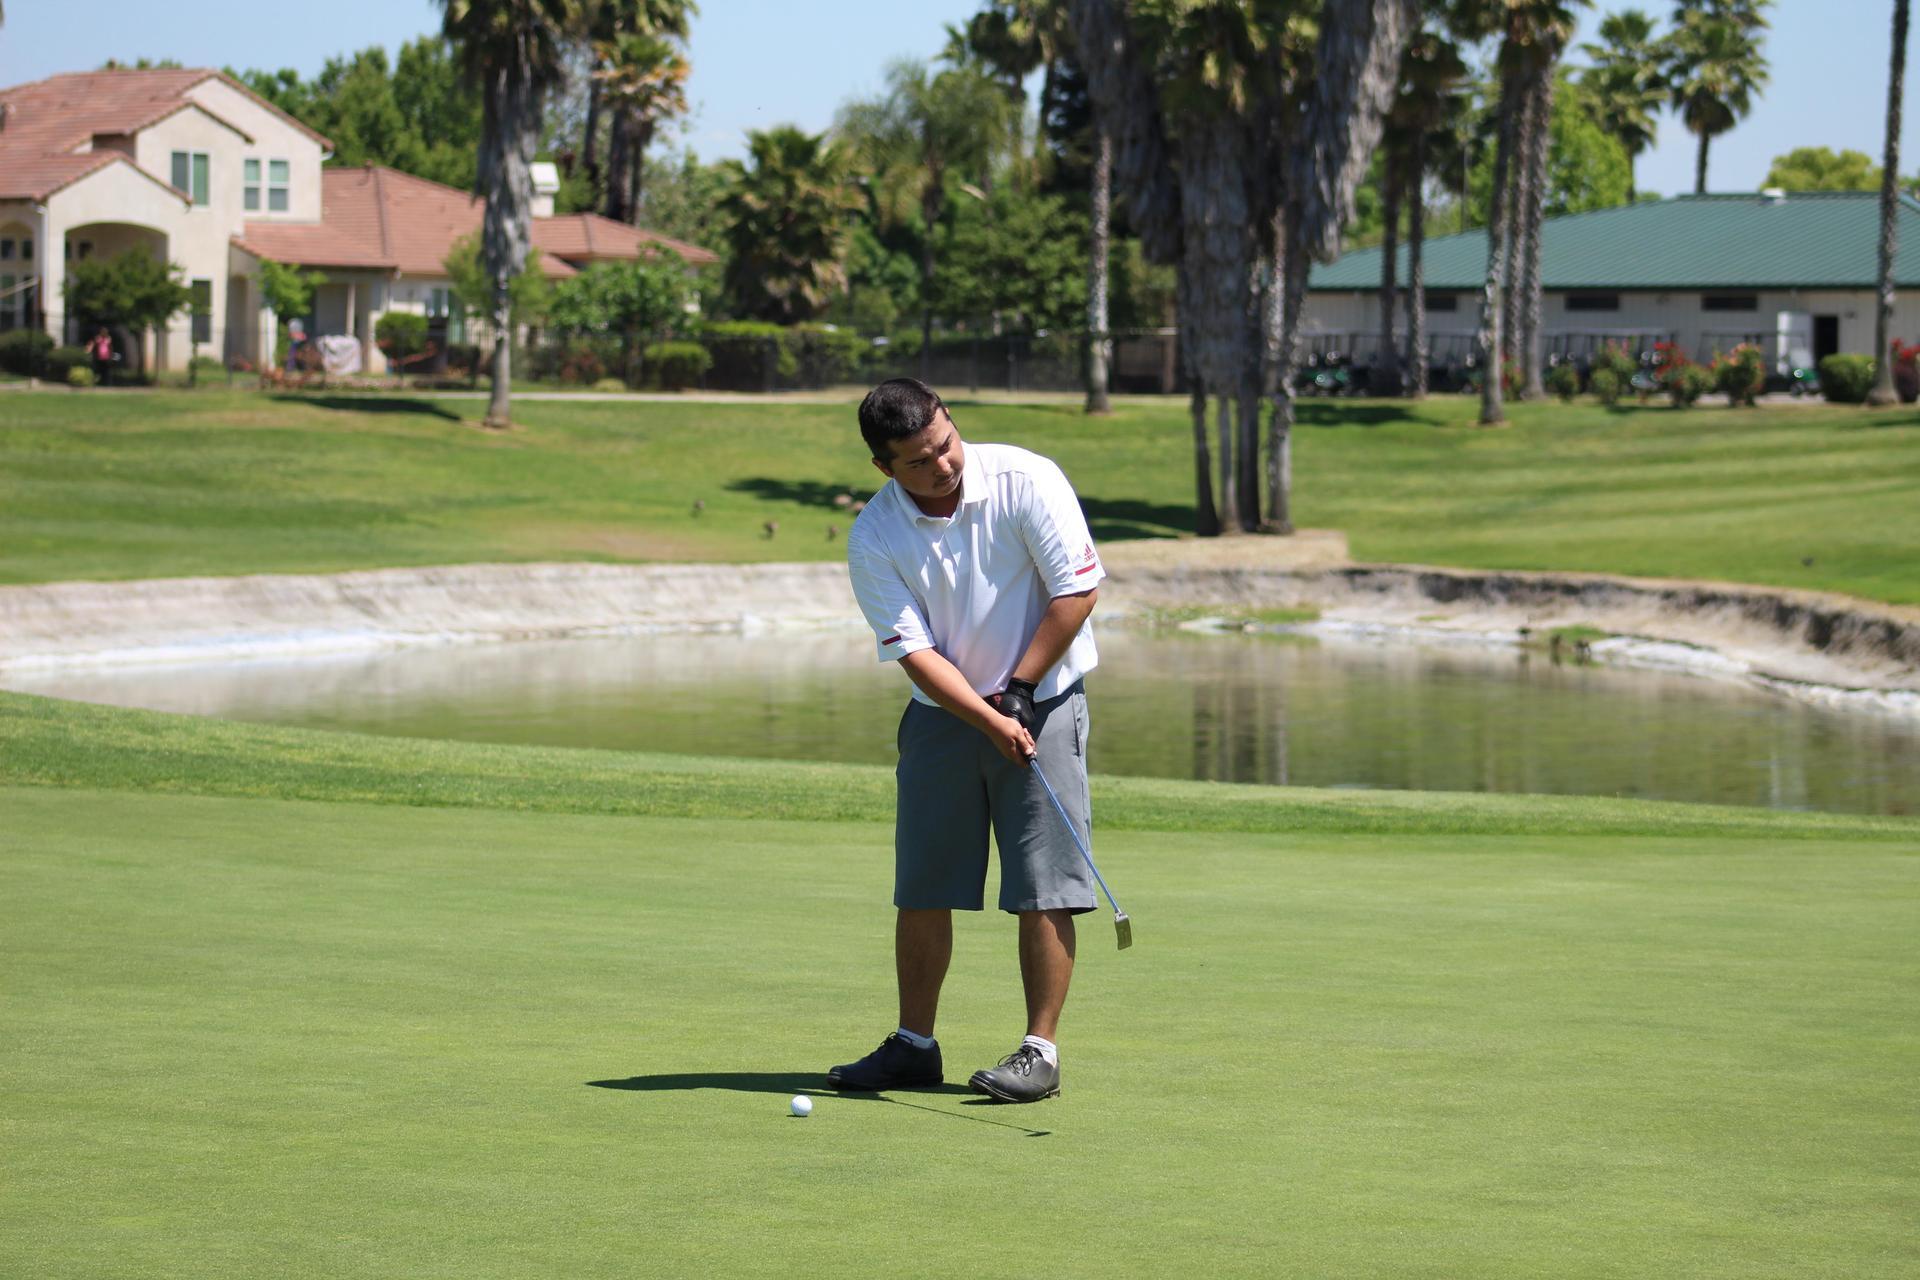 Boys Golf practicing at Pheasant Run.